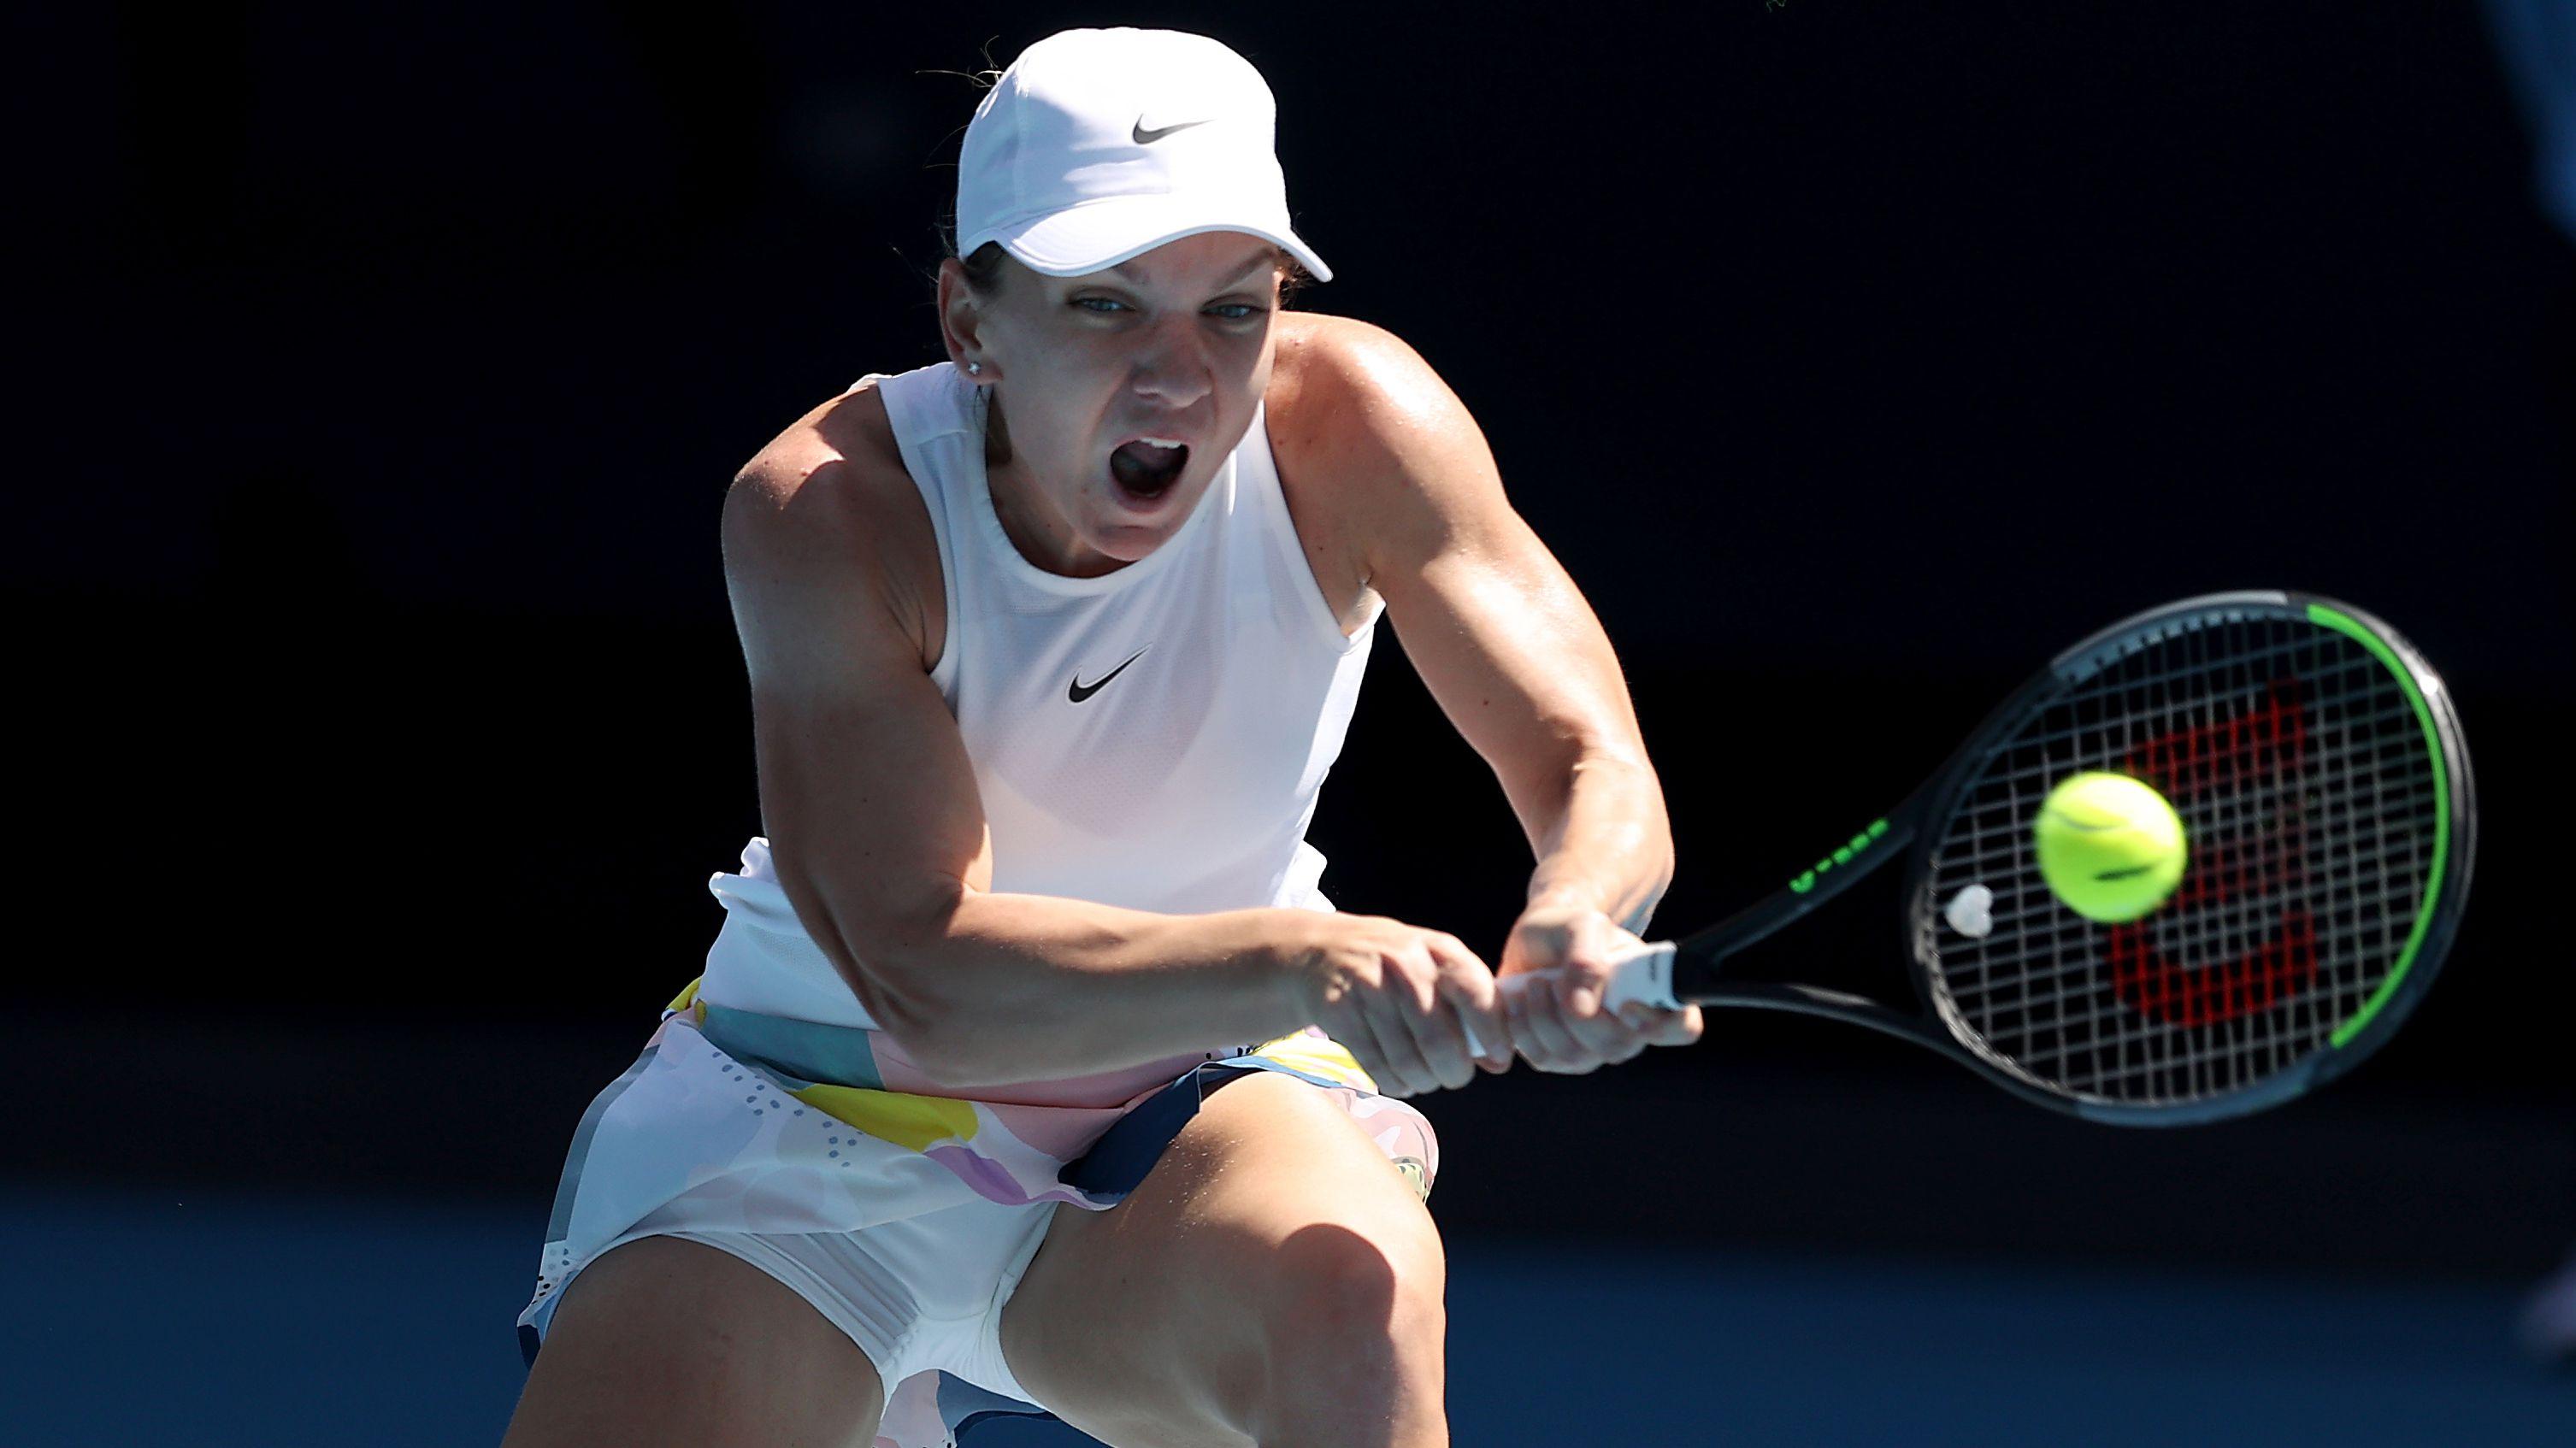 Simona Halep in scorching form as she reaches Australian Open semi final